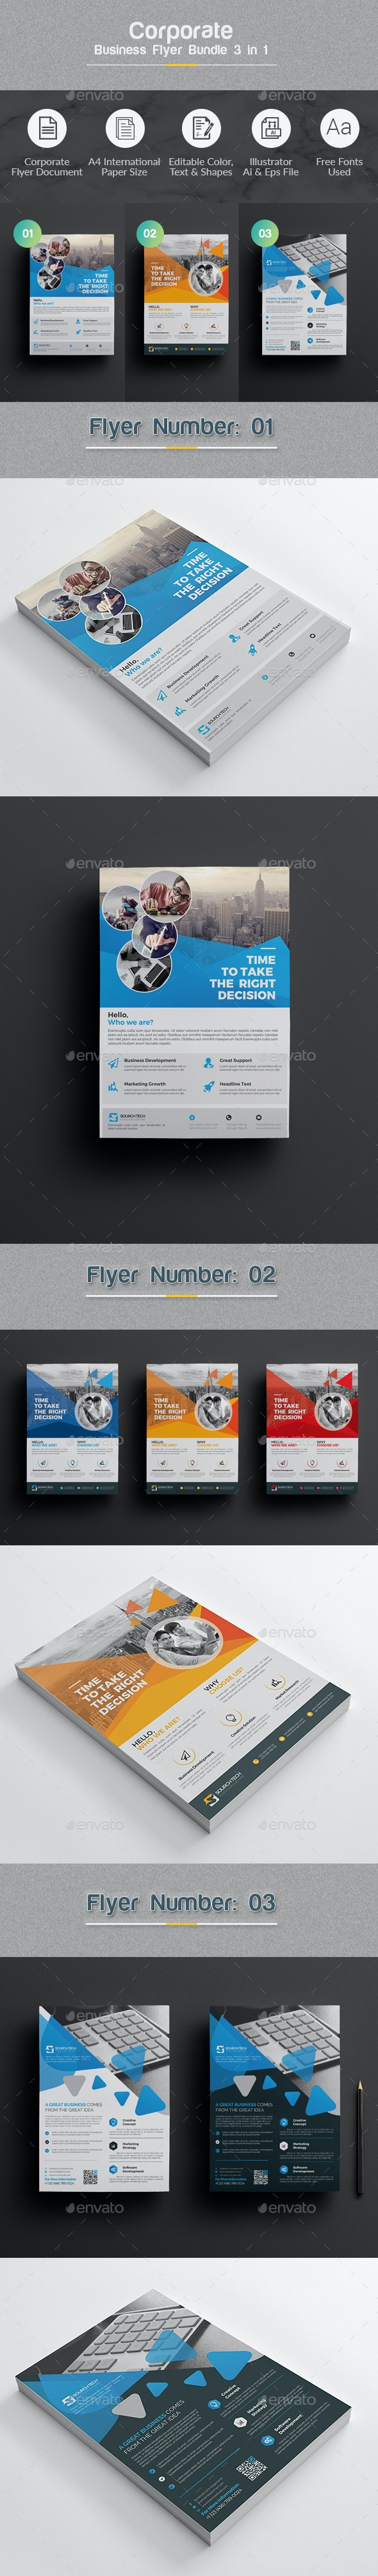 Flyer Template Bundle 3 in 1 - Corporate Flyers